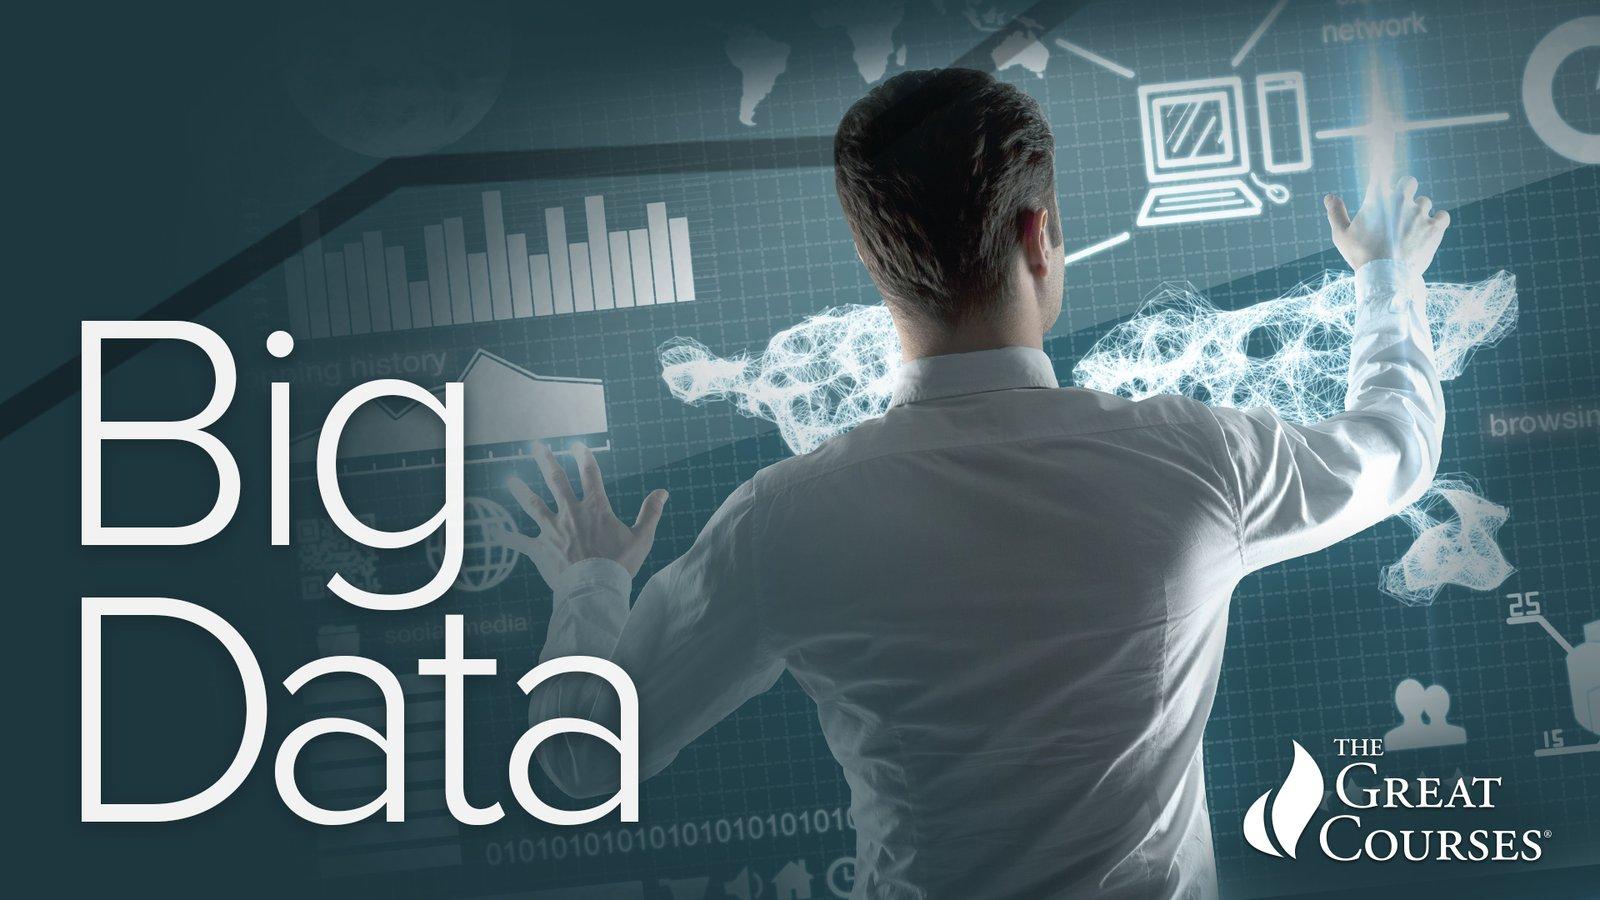 Big Data - How Data Analytics Is Transforming the World